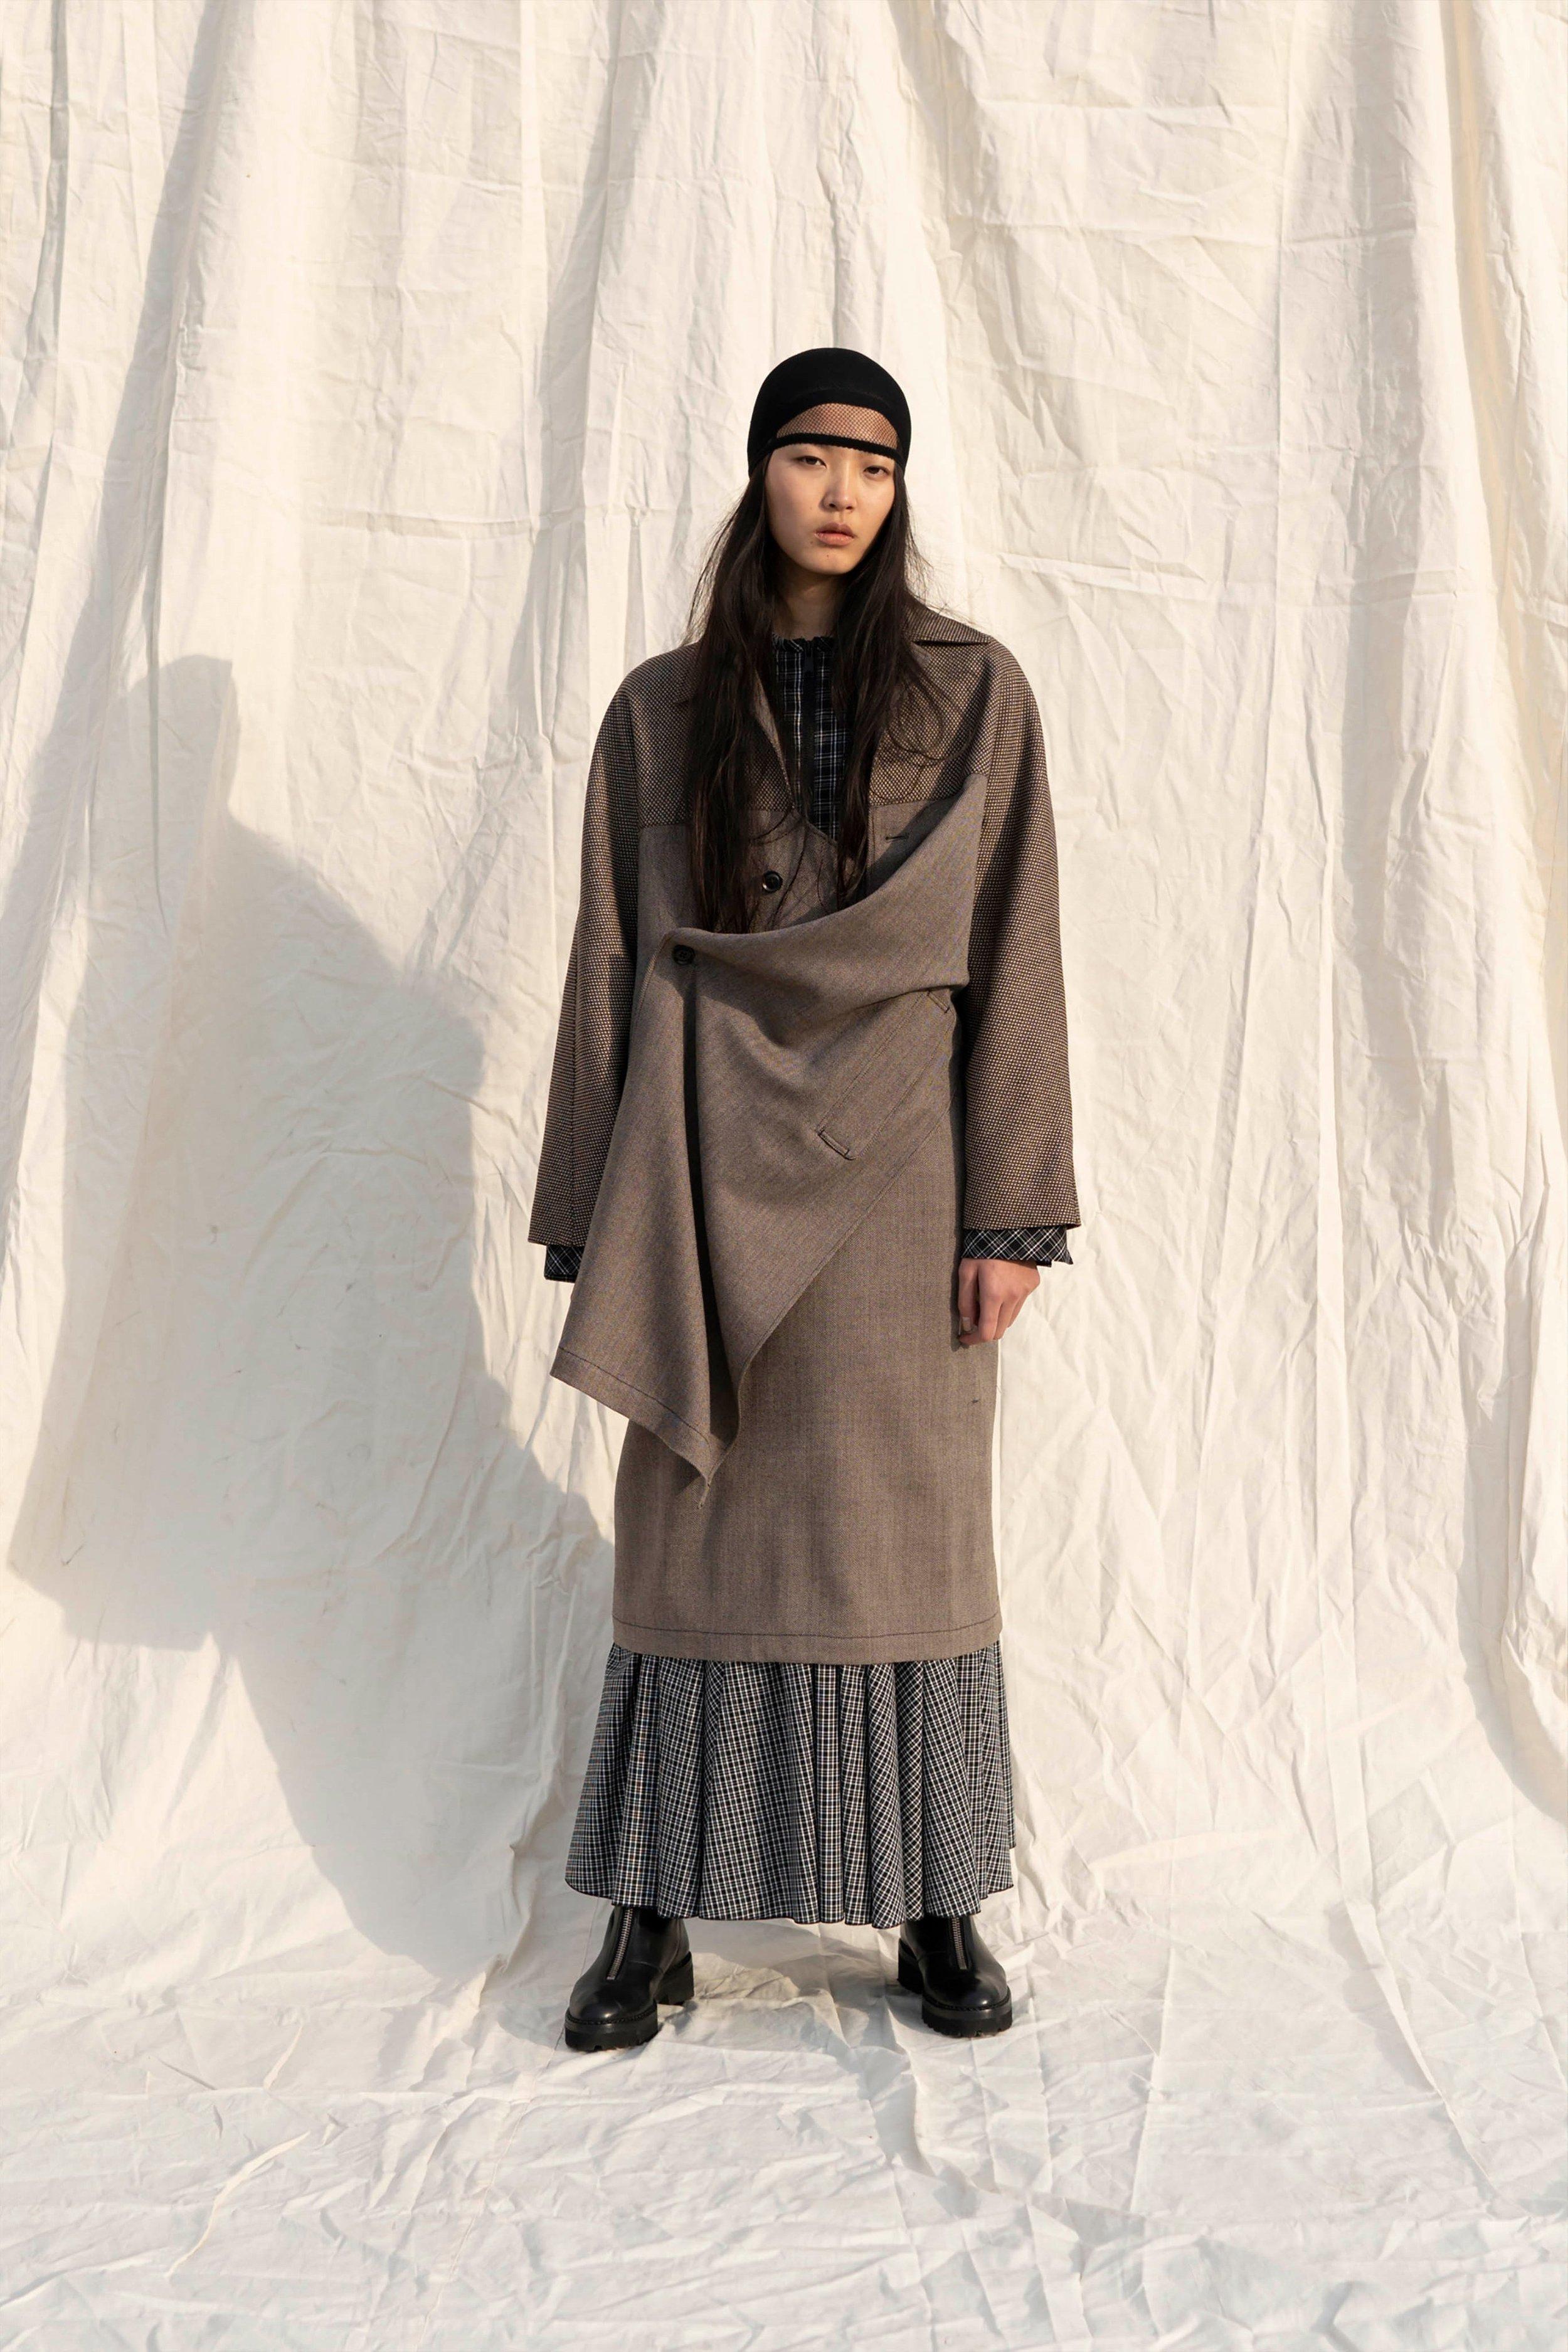 00048-Ys-Yohji-Yamamoto-FALL-19-Ready-To-Wear.jpg